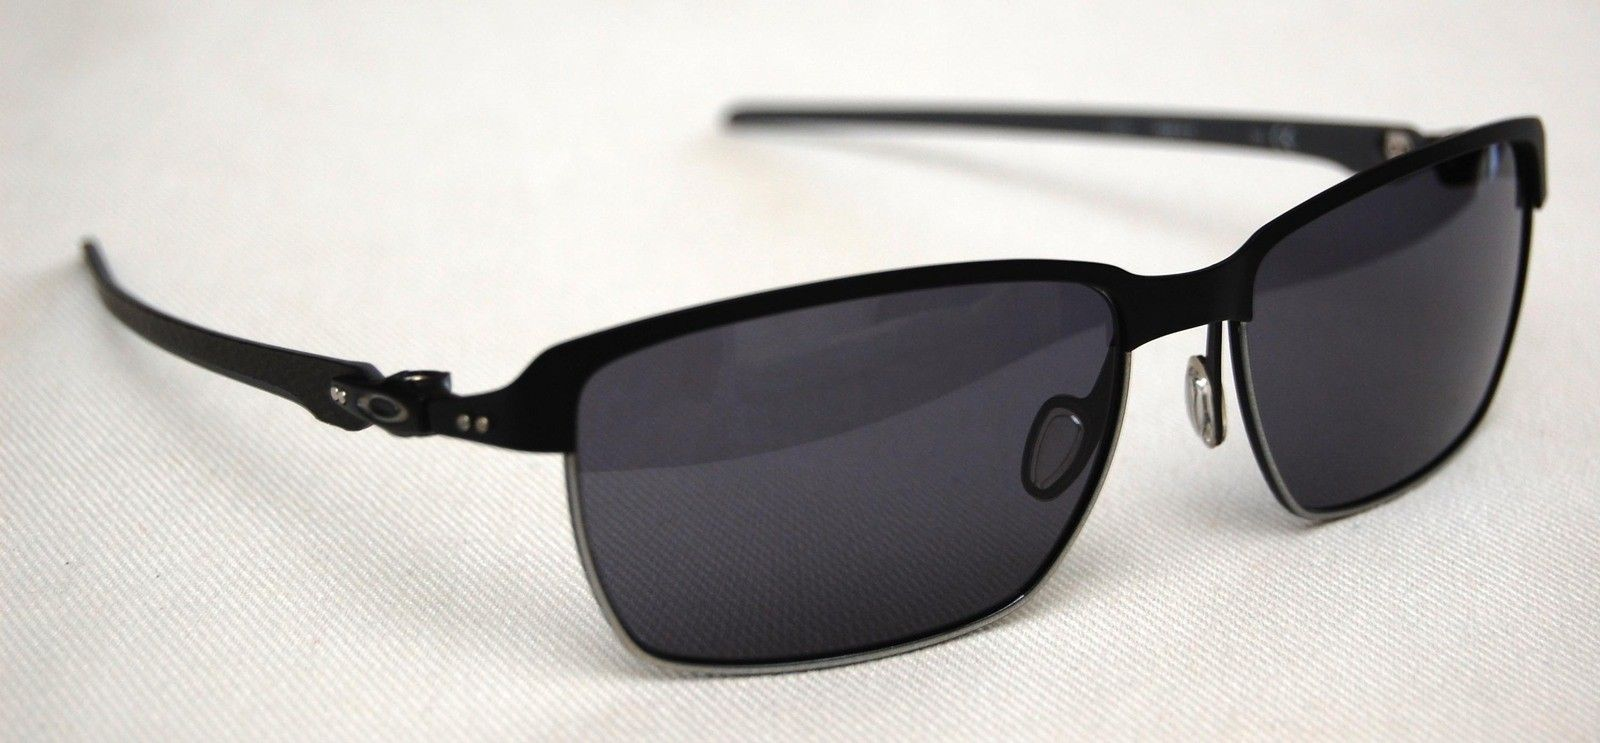 Tinfoil Carbon OO6018-01 Matte Black / Silver | Grey Lens - 04.jpg